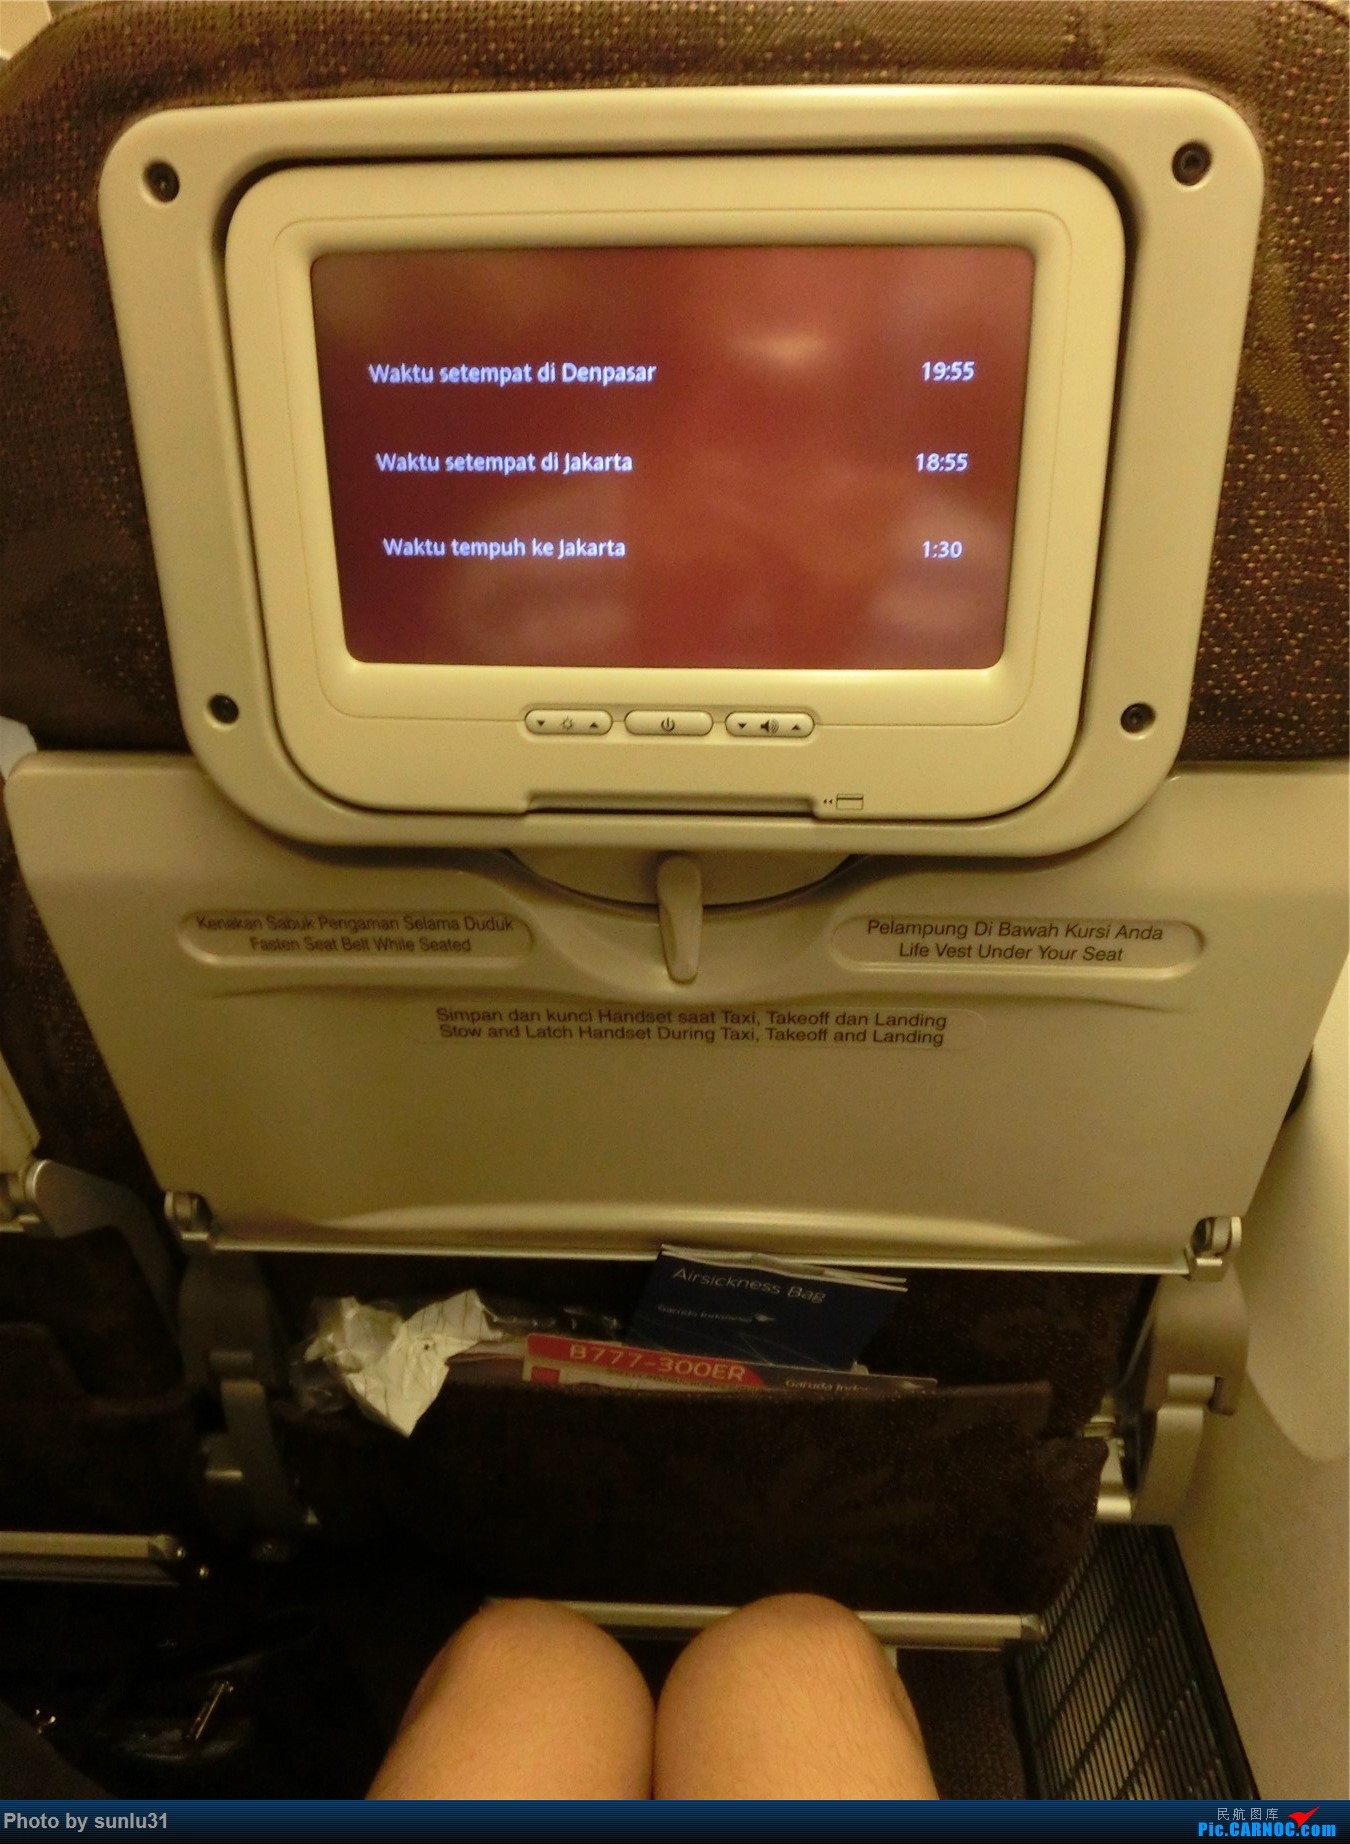 Re:[原创]【Mitchell的飞行时光】四段少见的GA游记,多灾多难的巴厘岛之行(持续更新中) BOEING 777-300ER PK-GID 印度尼西亚巴厘岛登巴萨努拉·莱伊国际机场